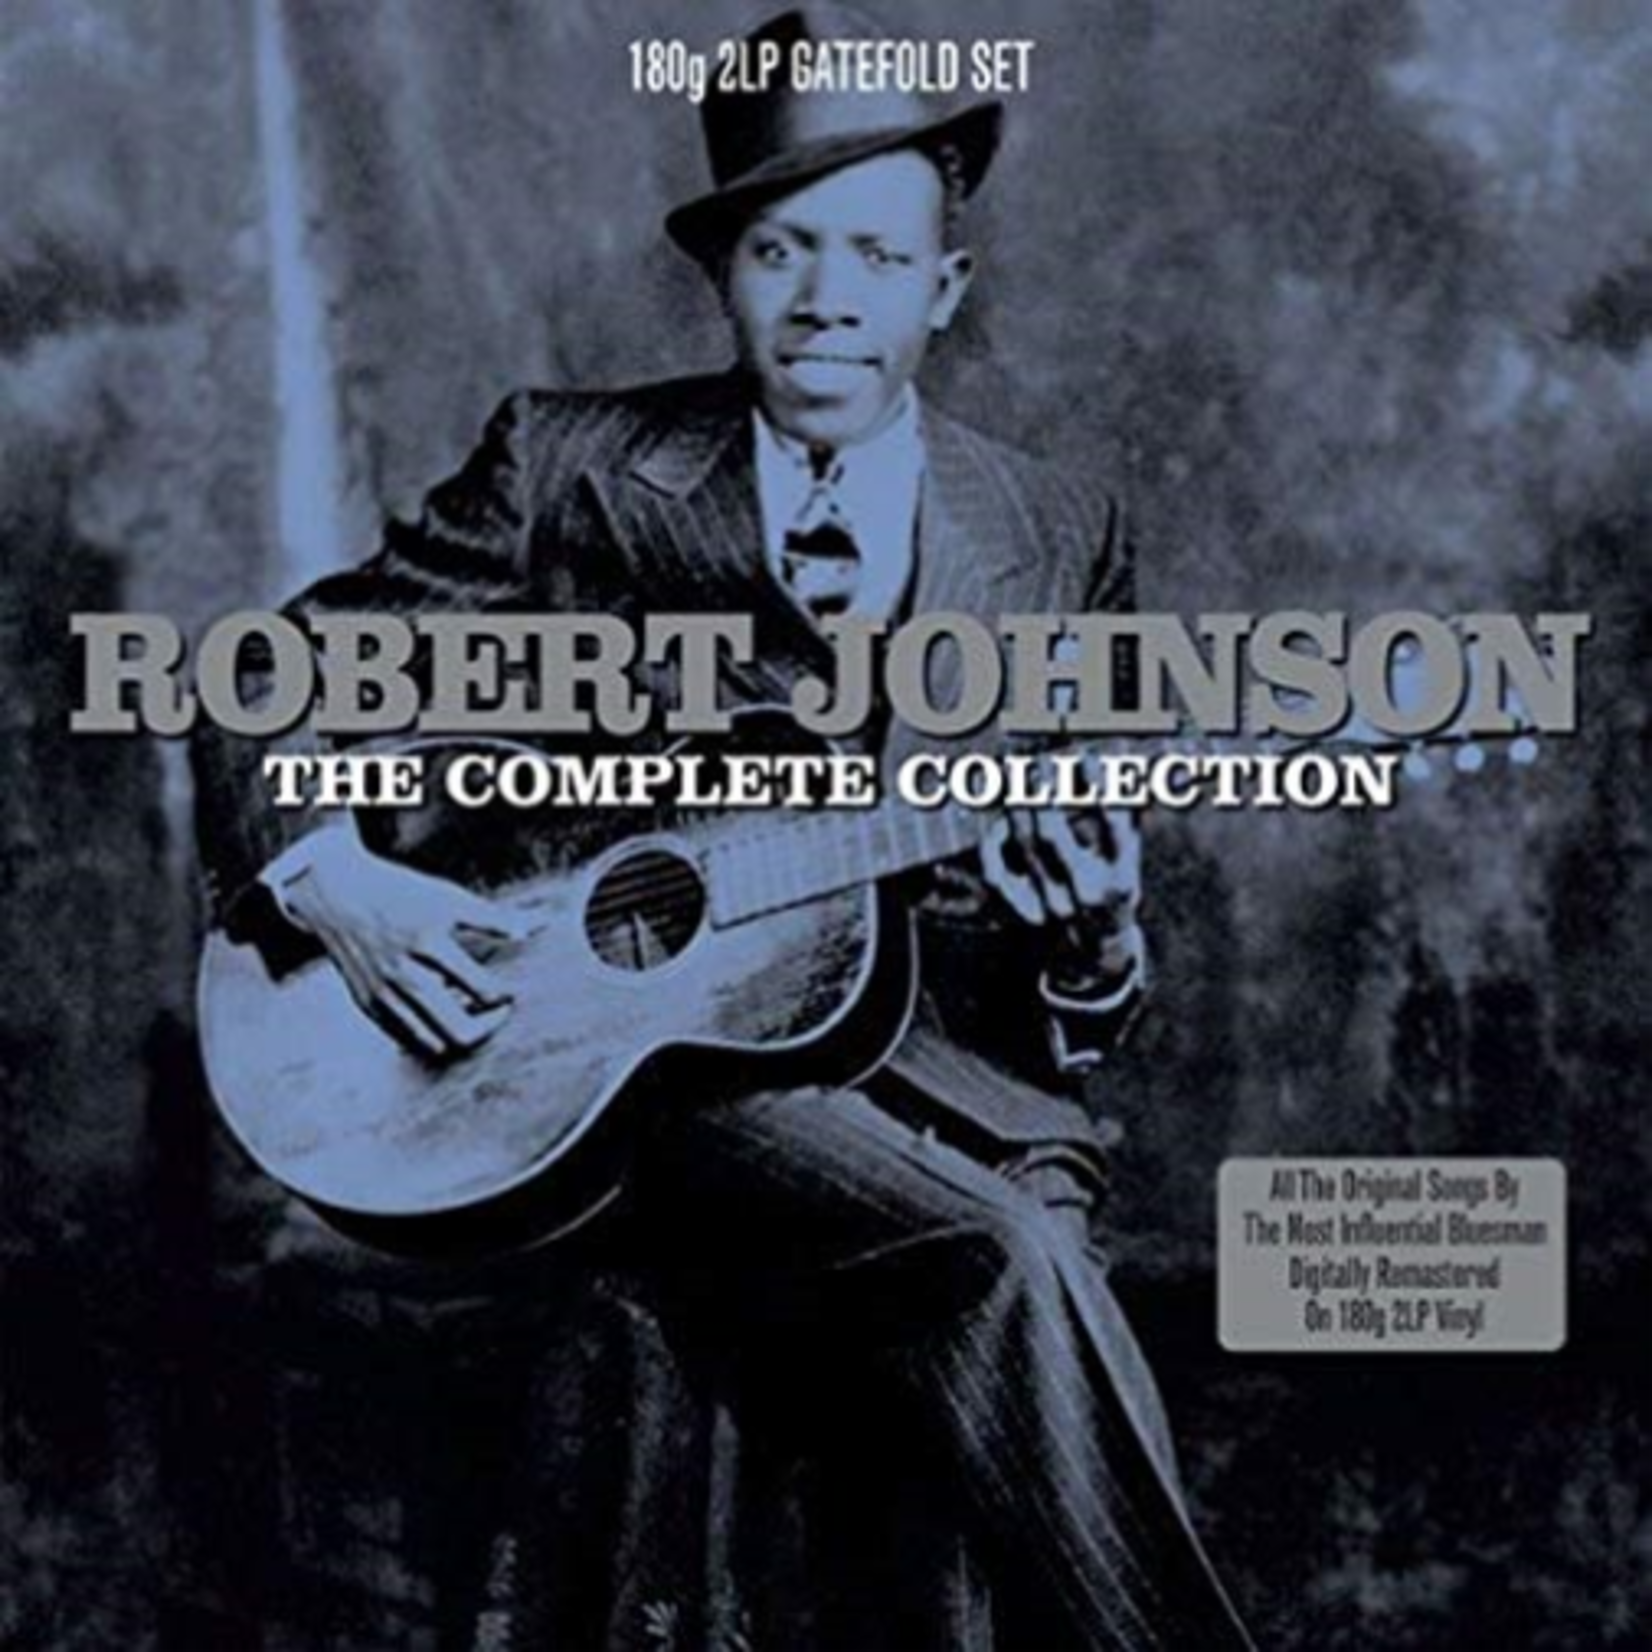 ROBERT JOHNSON COMPLETE COLLECTION (2LP/180 HQ VINYL)